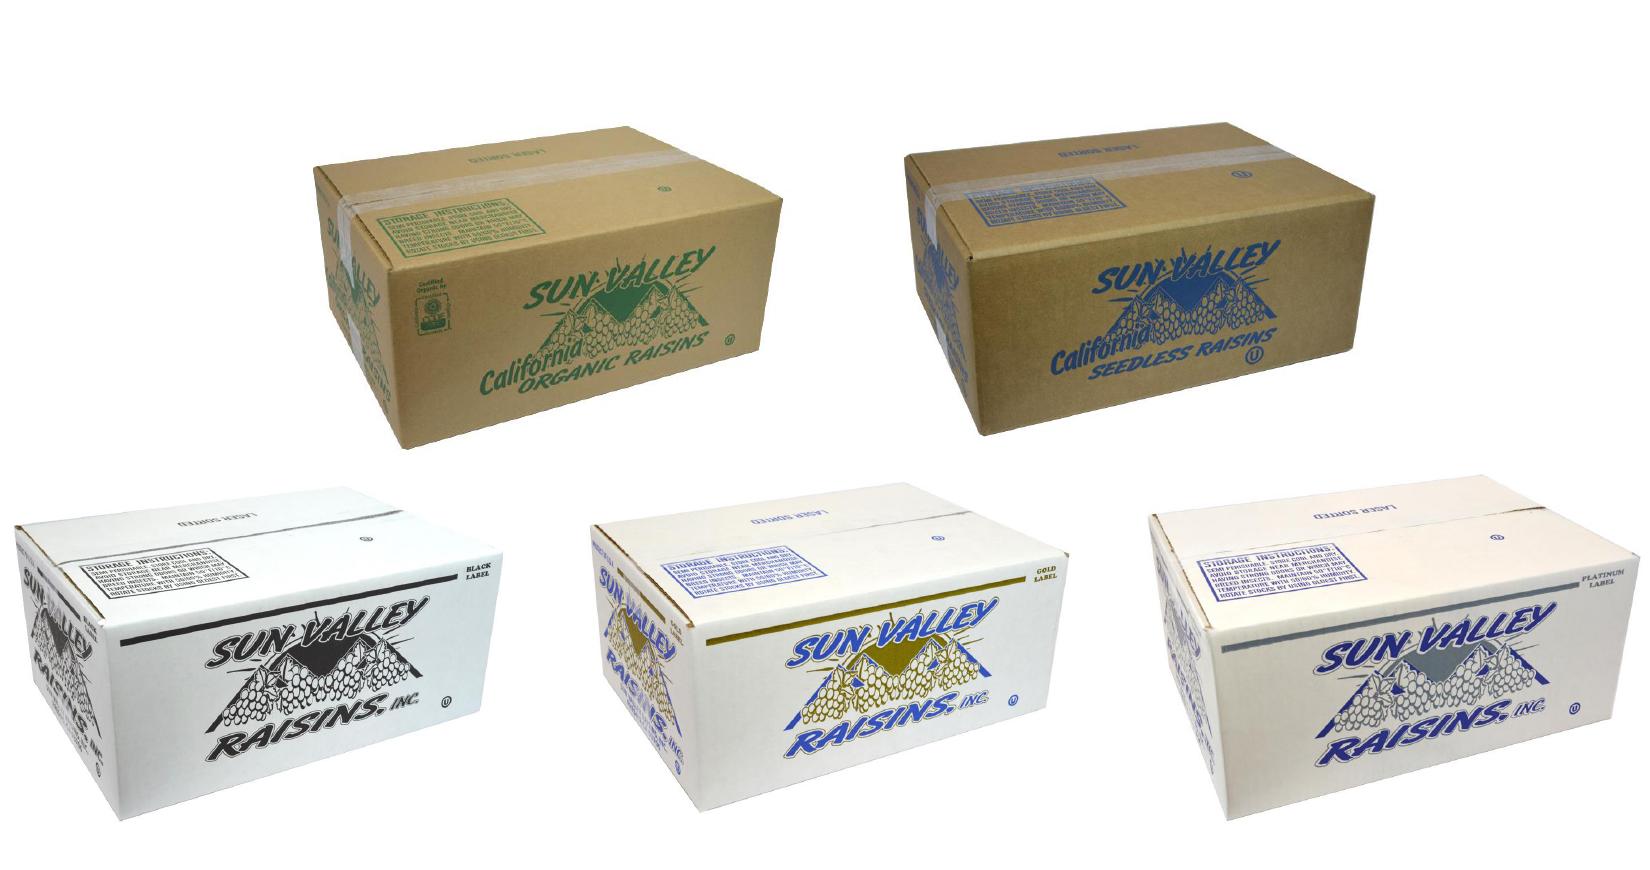 Sun Valley Raisins <br> Bulk Box